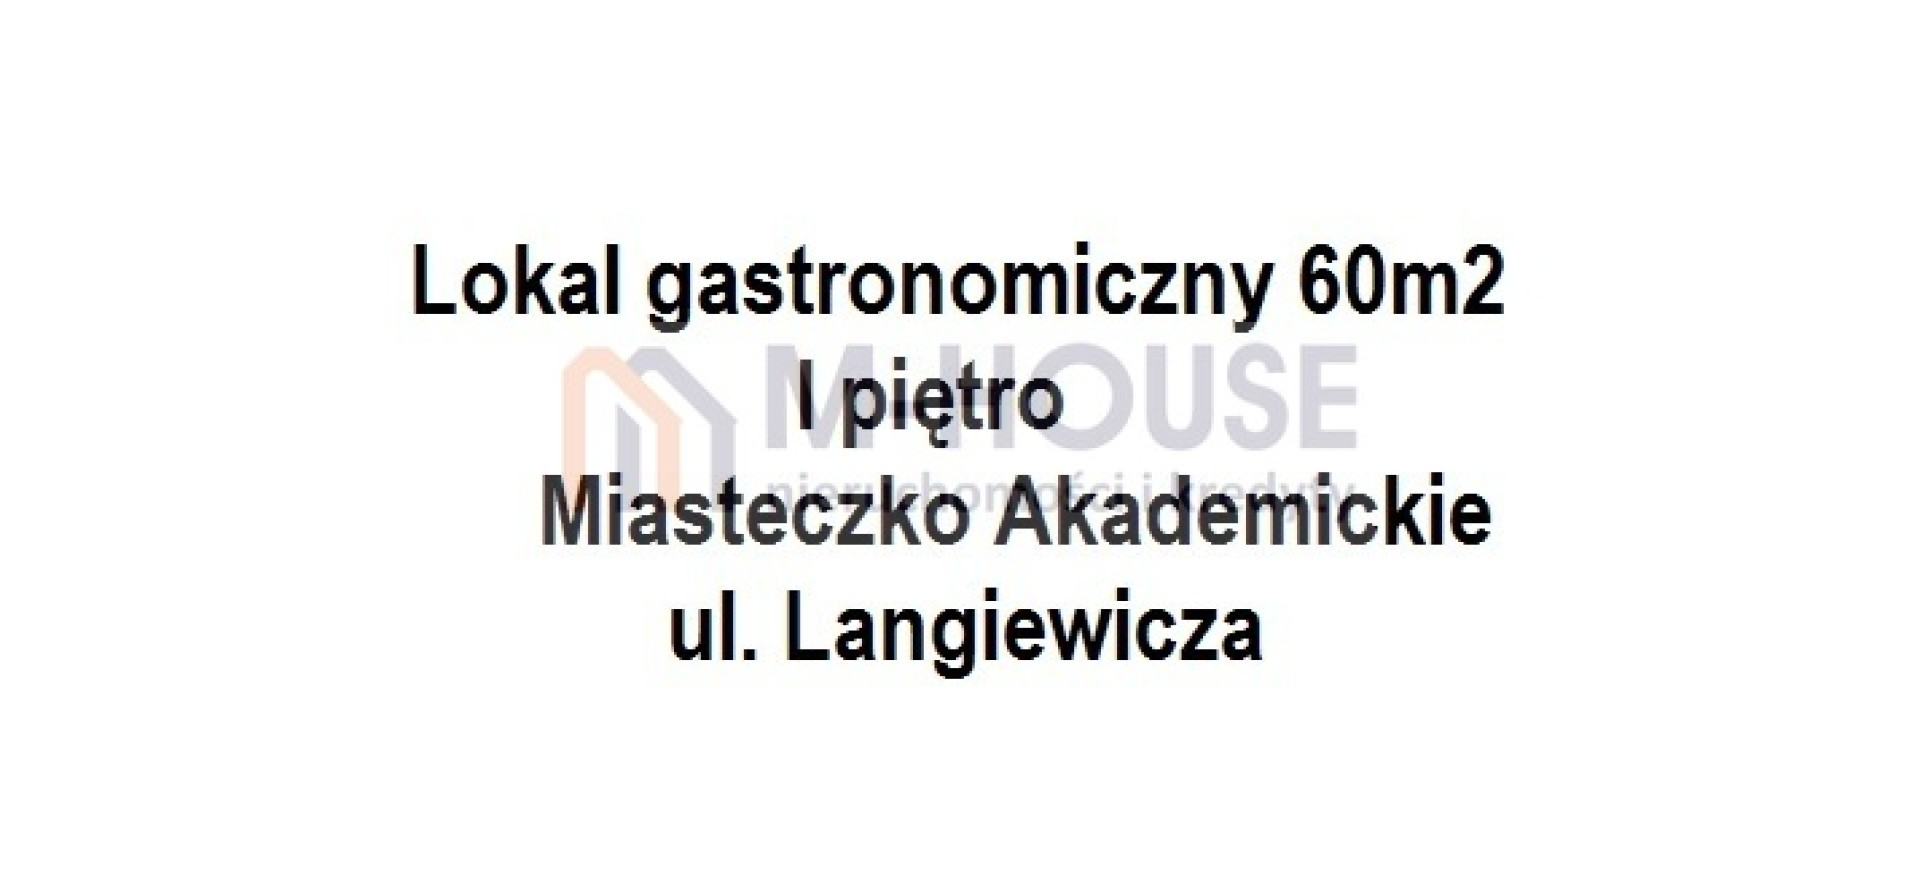 Lokal 60m2, Miasteczko Akademickie